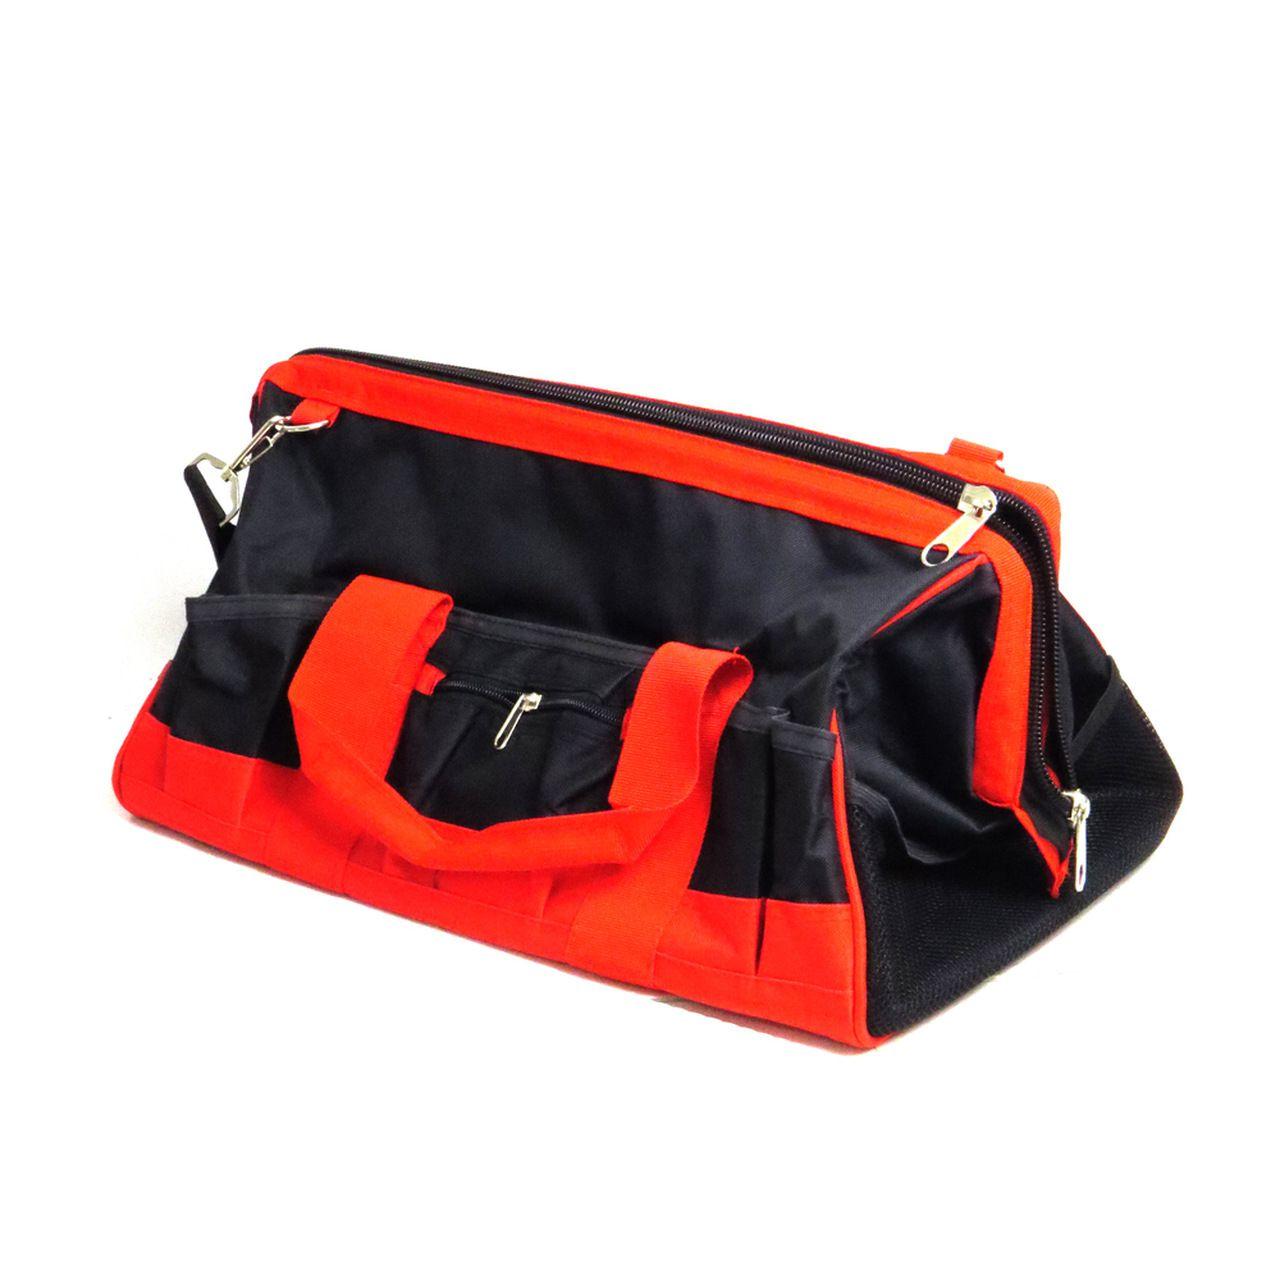 Bolsa Para Ferramentas 32 Bolsos 460 X 280 X 305mm Mtx